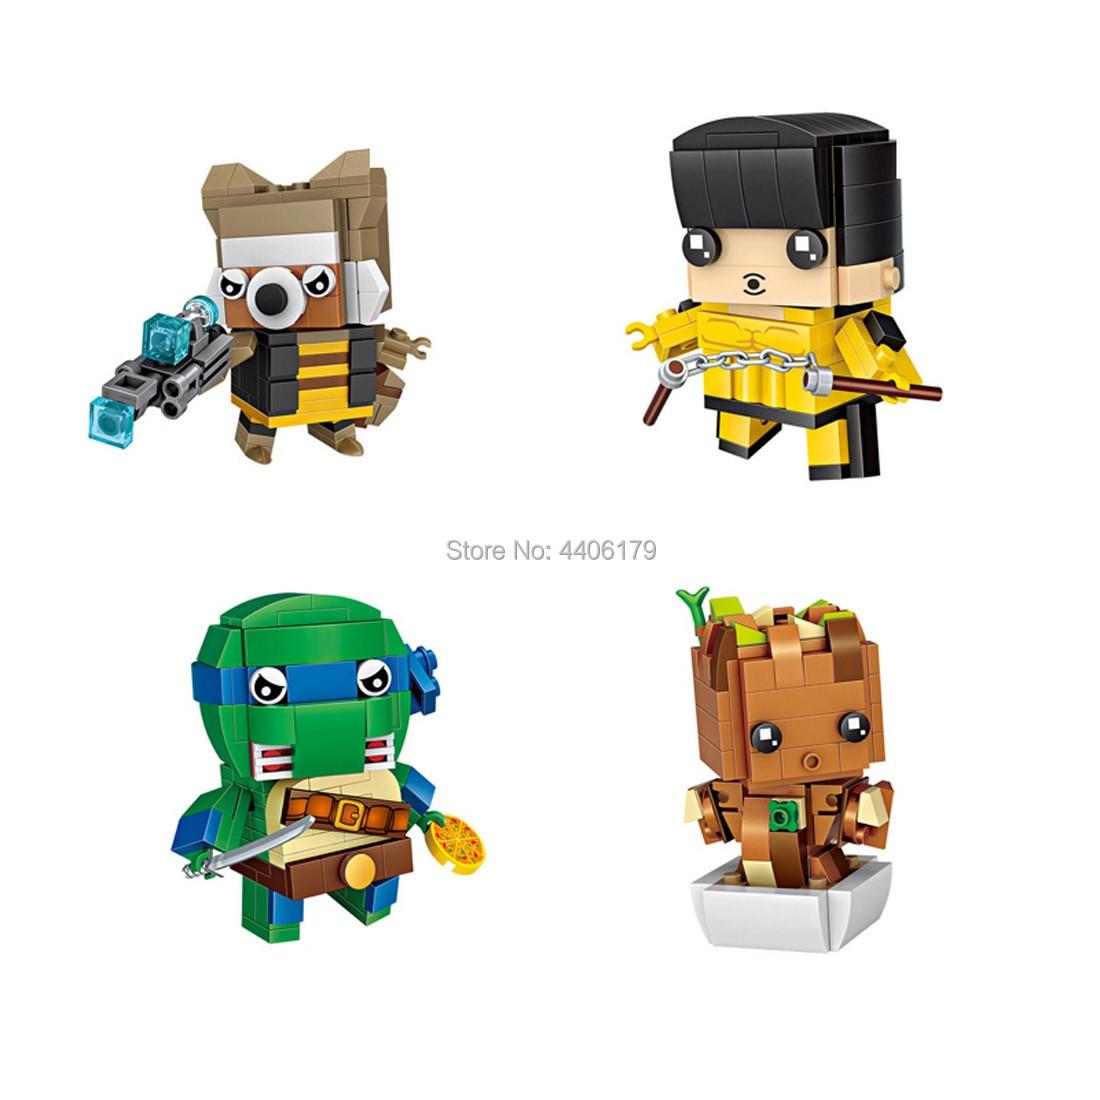 hot LegoINGlys creators Marvel Super hero mini Rocket raccoon Ninja Turtle Micro Diamond Building Block figures bricks toys gift